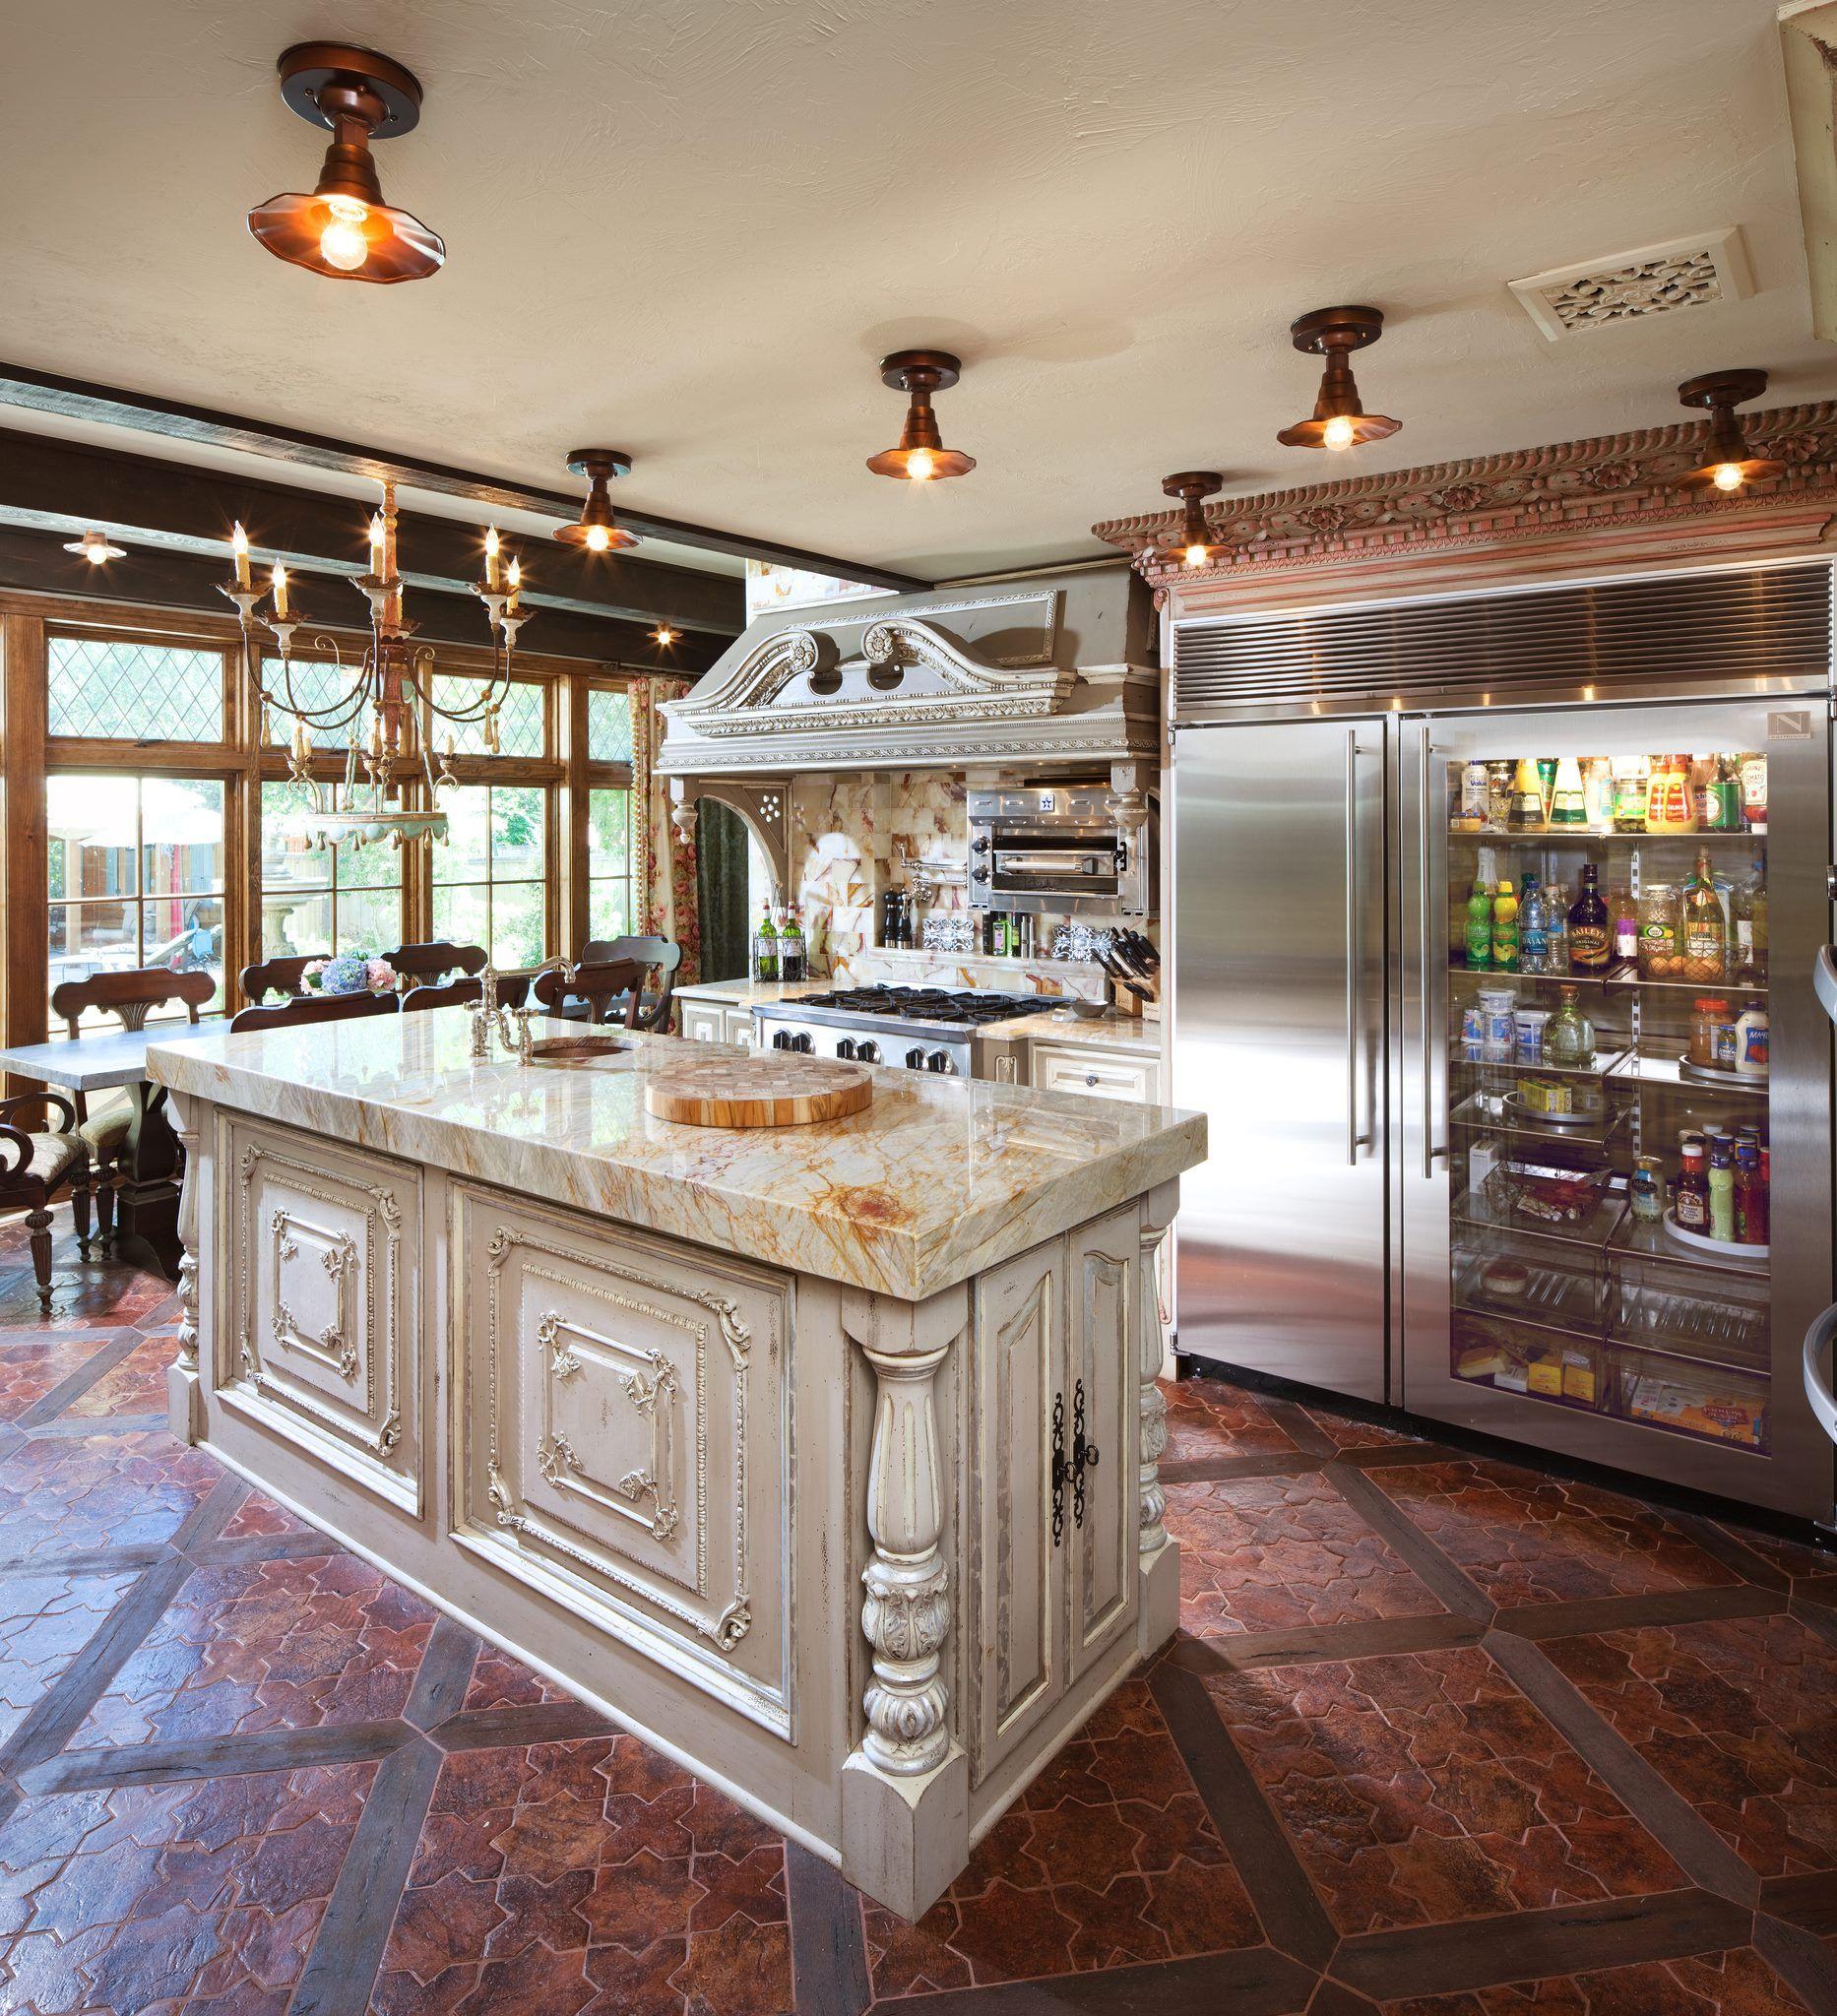 Atlanta Living, Chef's Kitchen! #chef #culinary #eat #food